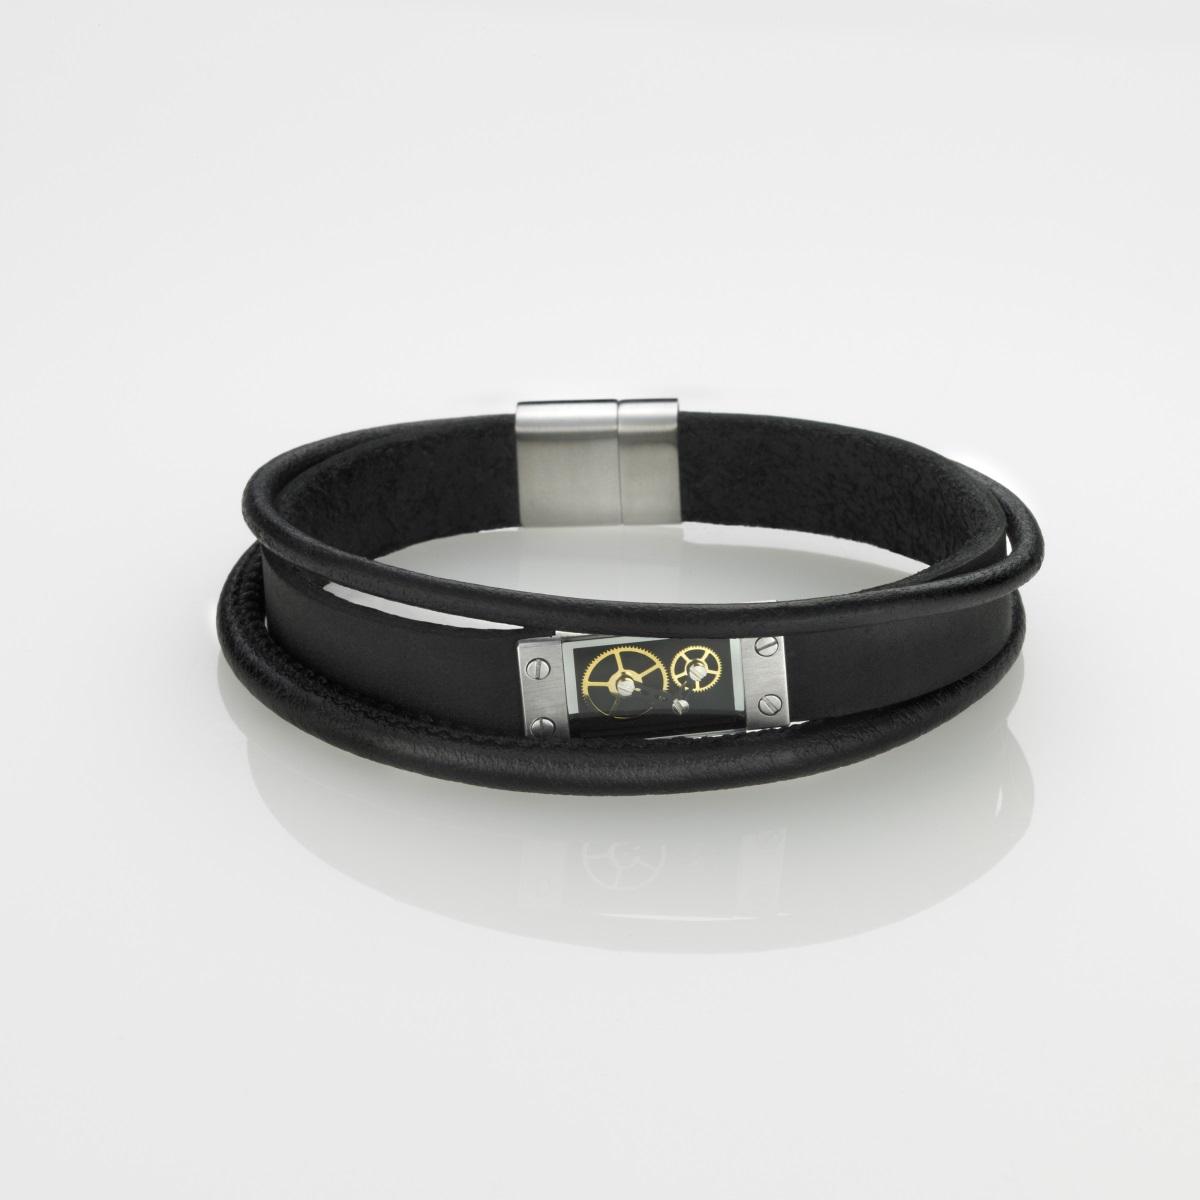 STORM London צמיד לגבר דגם Cog Leather - שחור